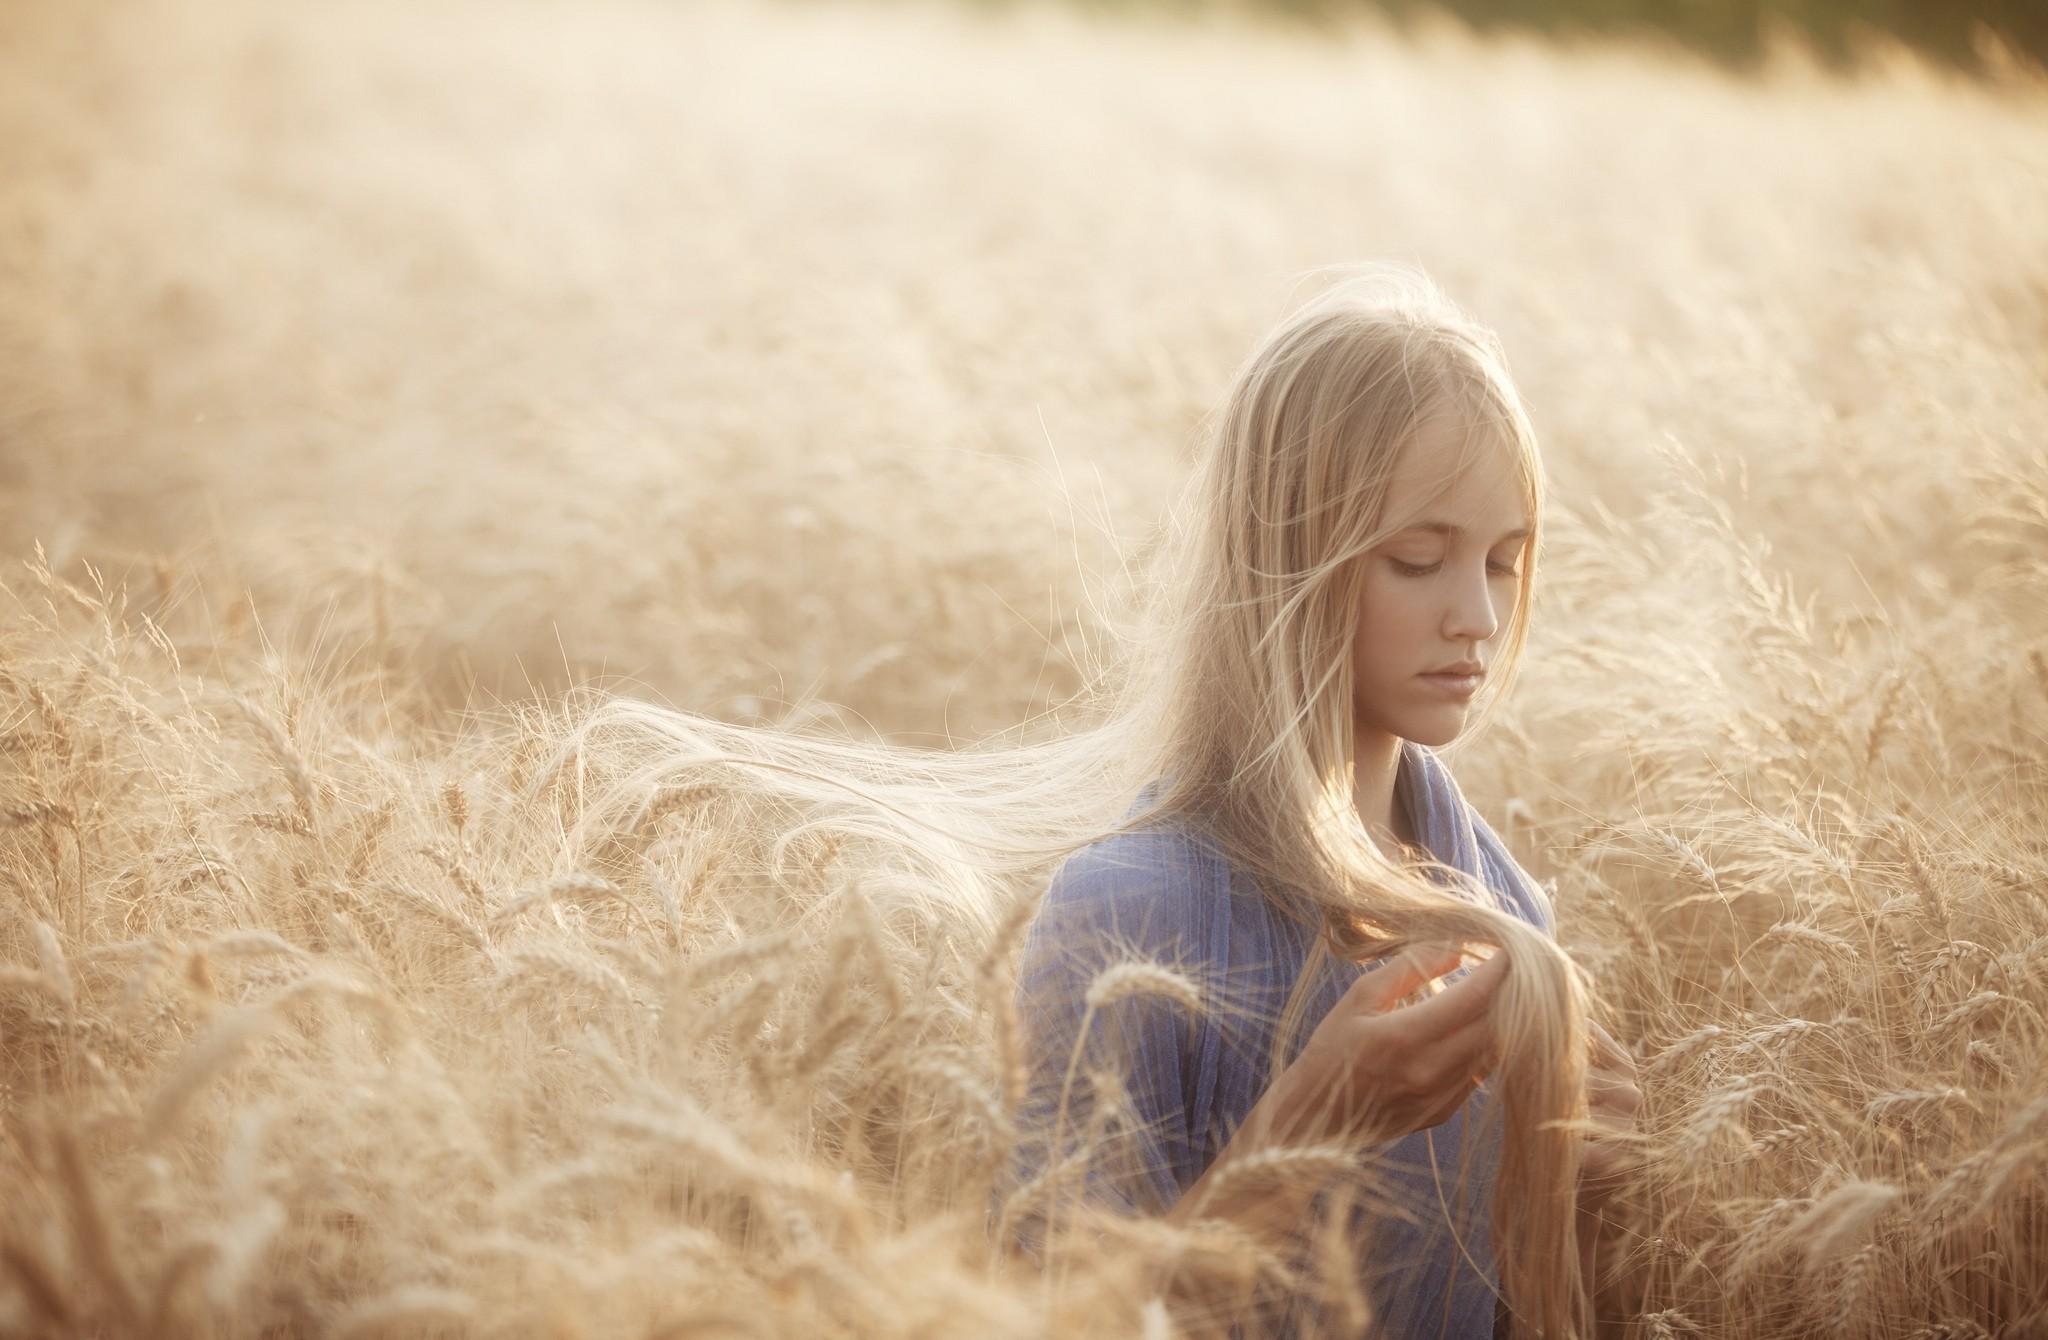 блондинка дерево поле blonde tree field  № 1377113 бесплатно